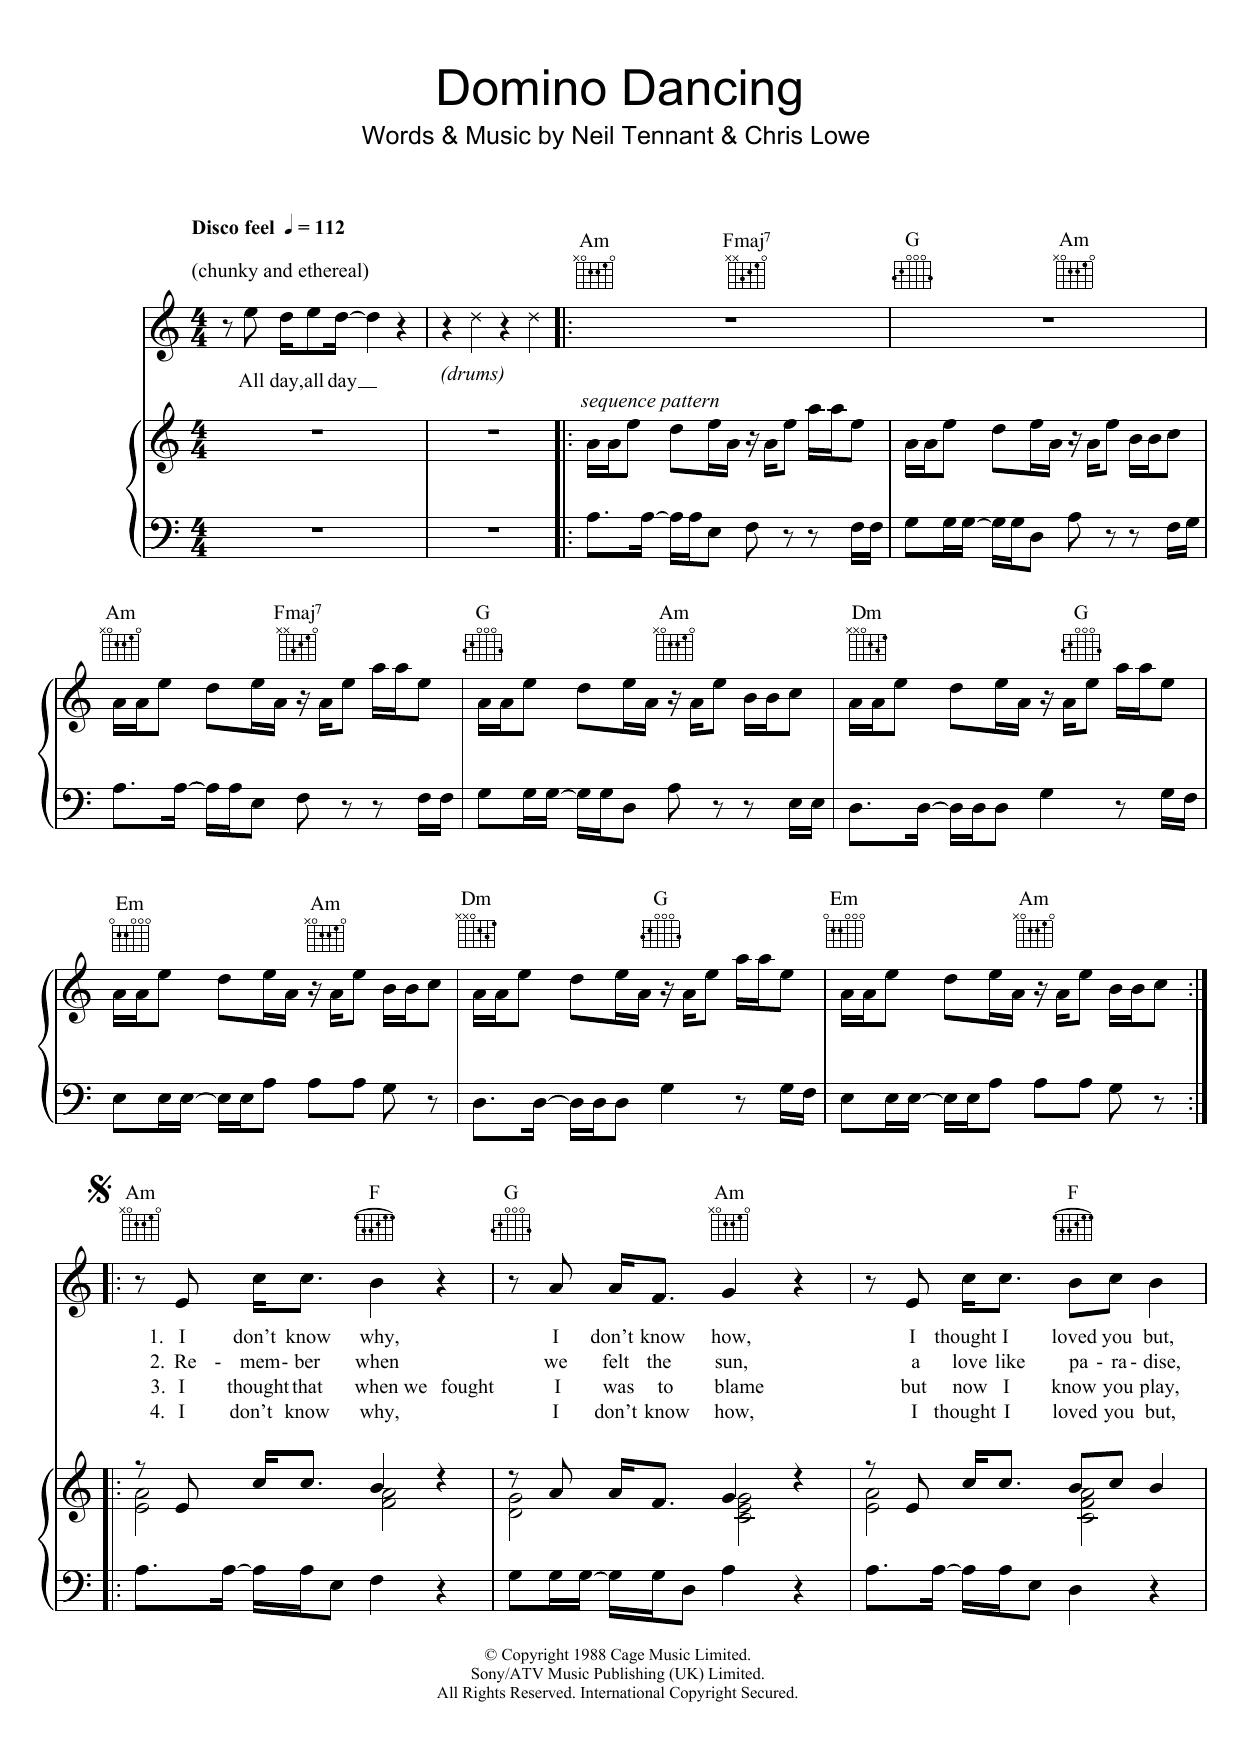 Domino Dancing Sheet Music